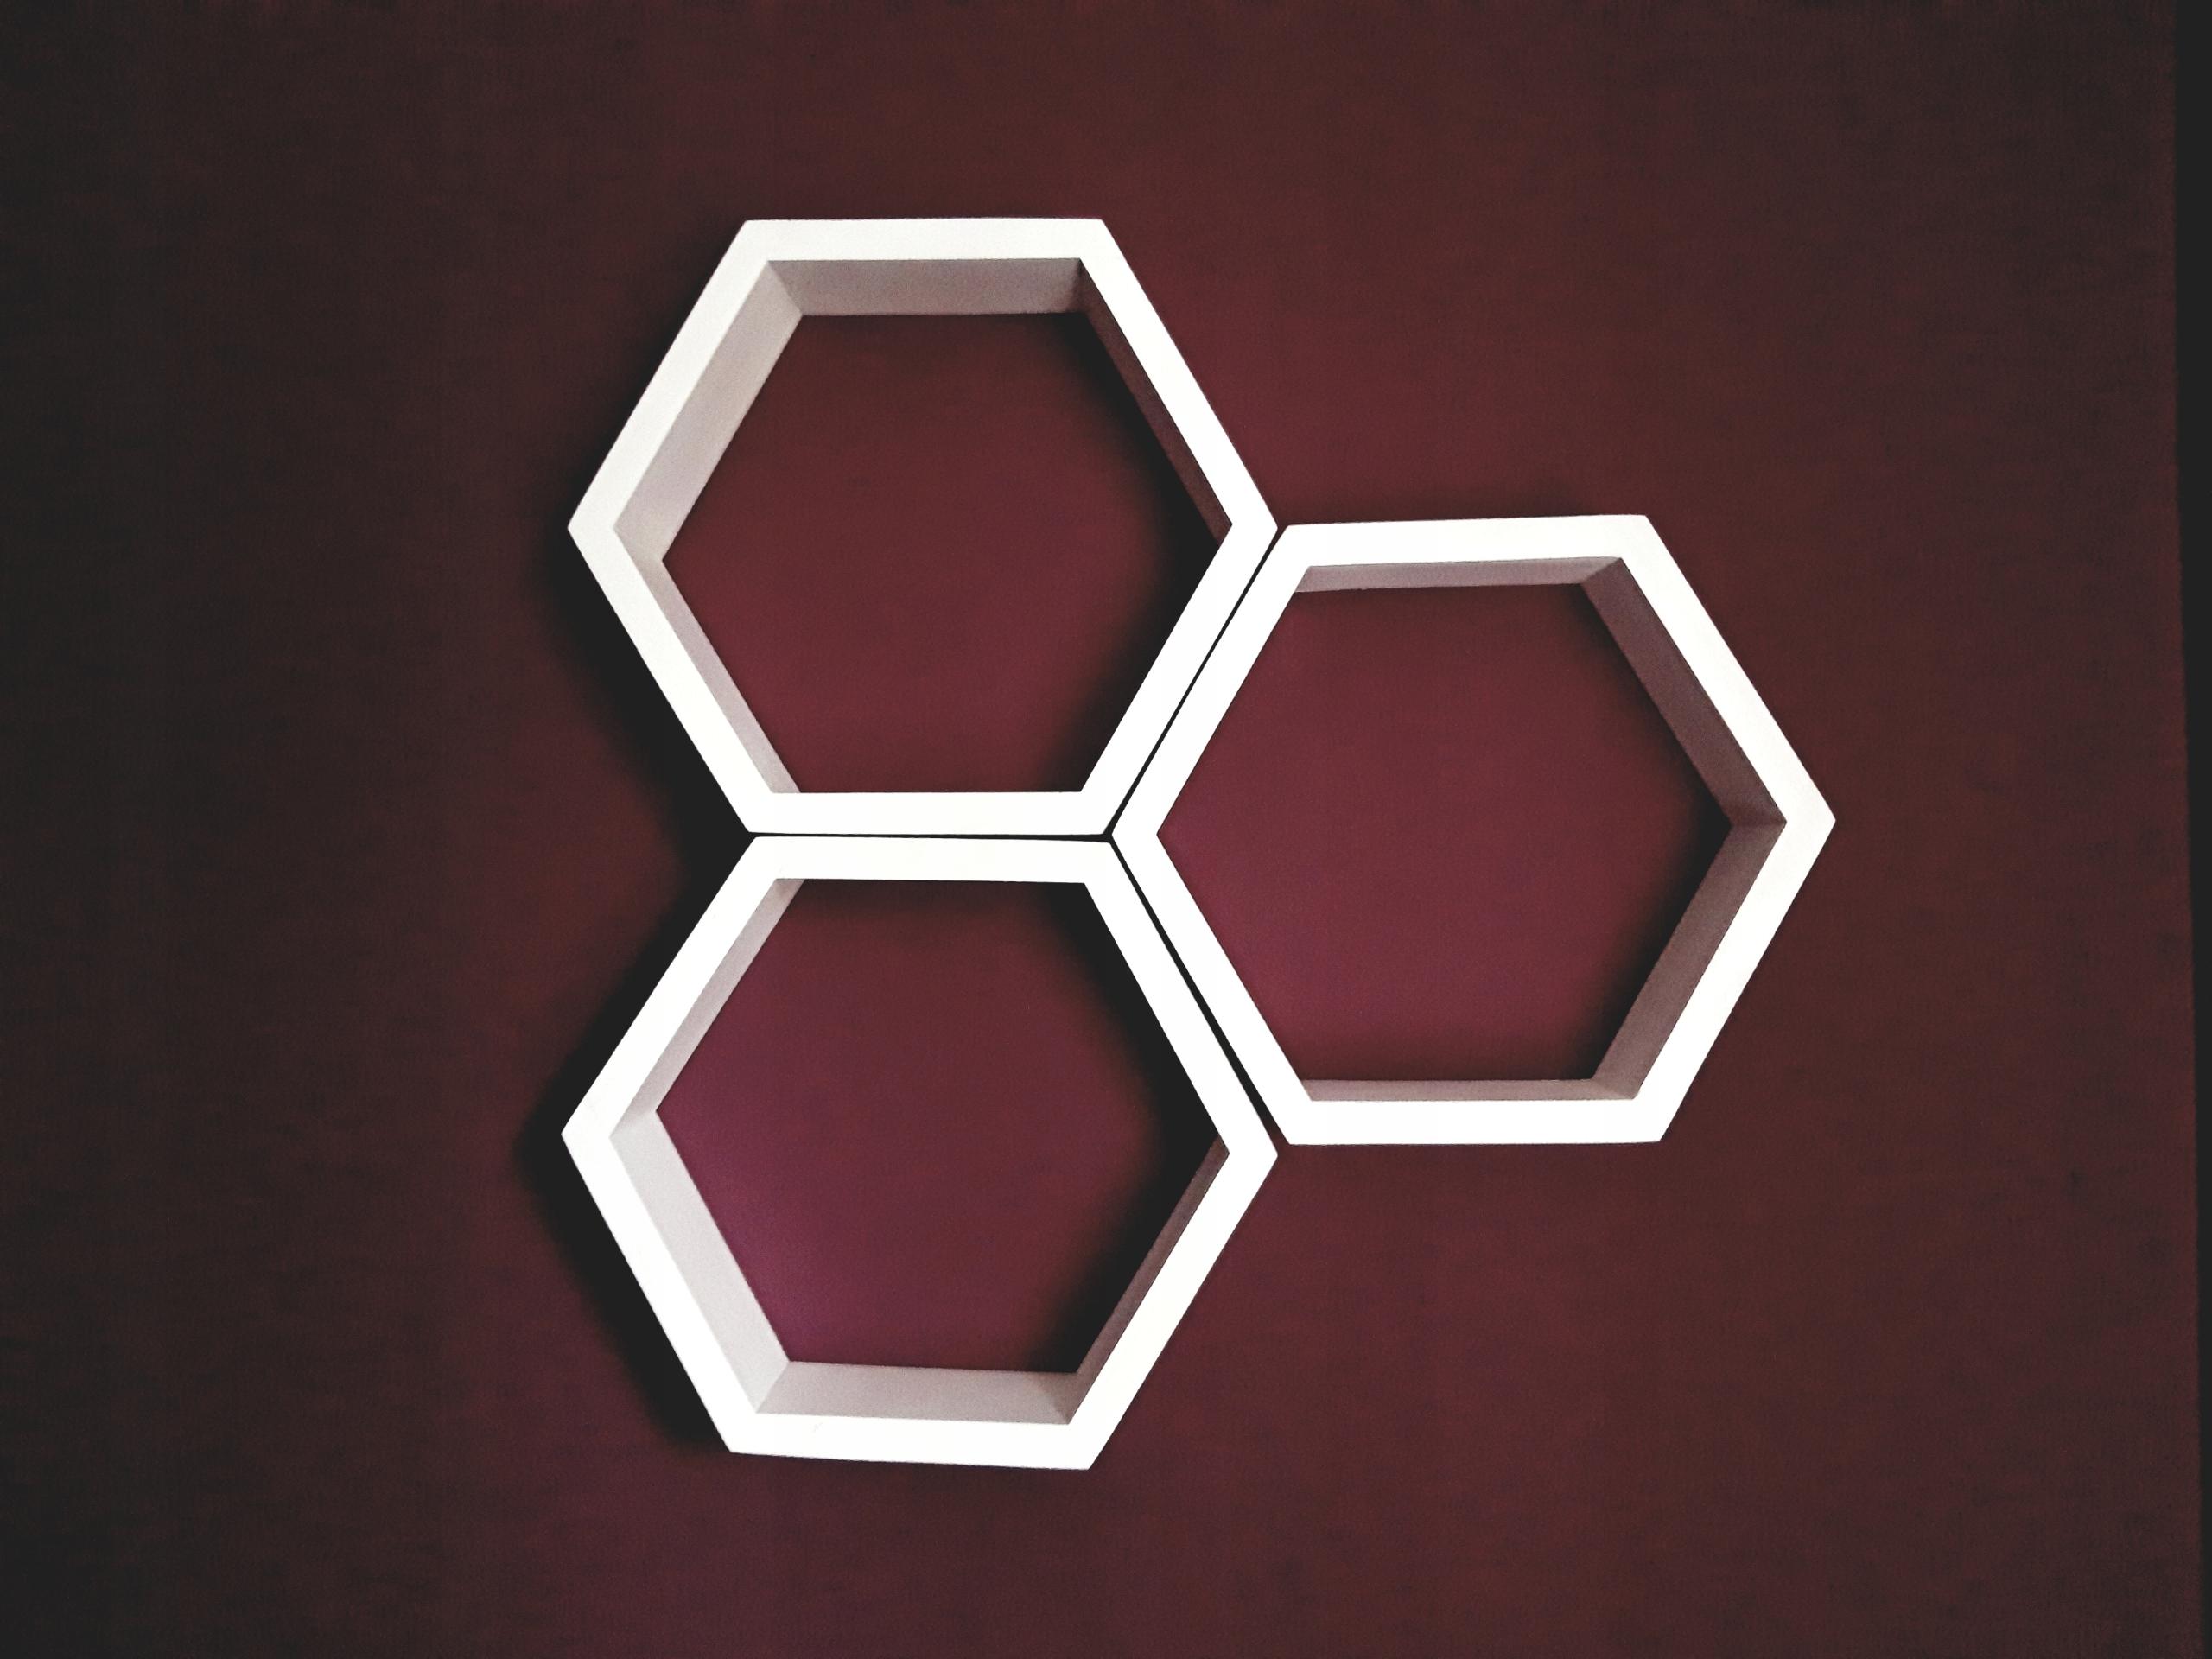 Półki Heksagon Plastry Miodu Komplet 3 Szt Białe